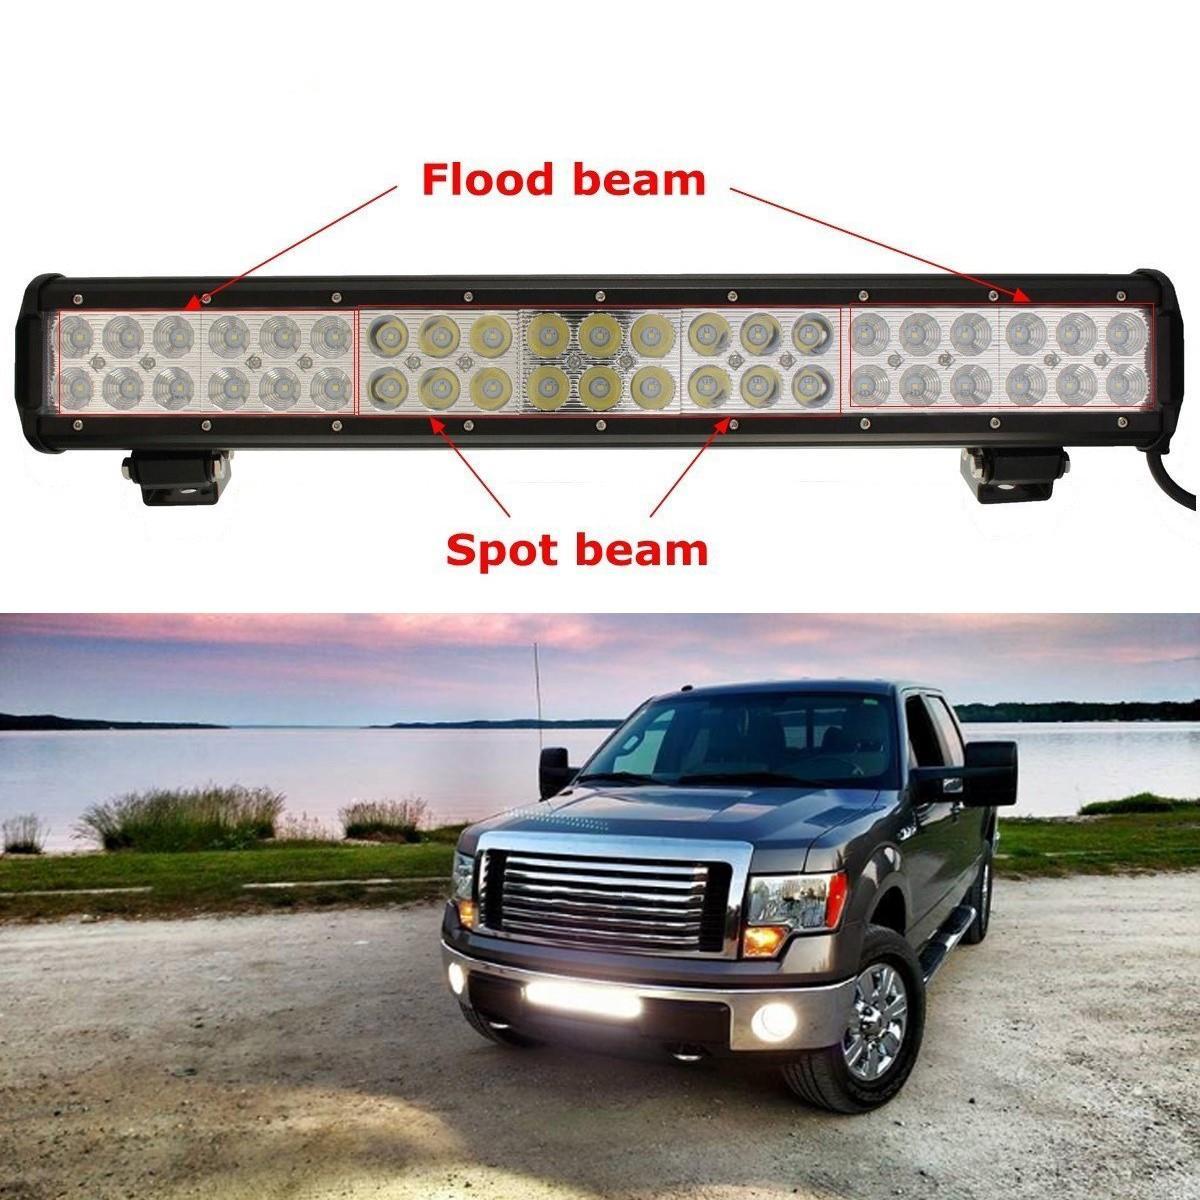 ФОТО 20Inch 126W LED Work Light Bar For Tractor Boat OffRoad 4WD 4x4 Truck SUV ATV Spot Flood Combo Beam 12V 24V